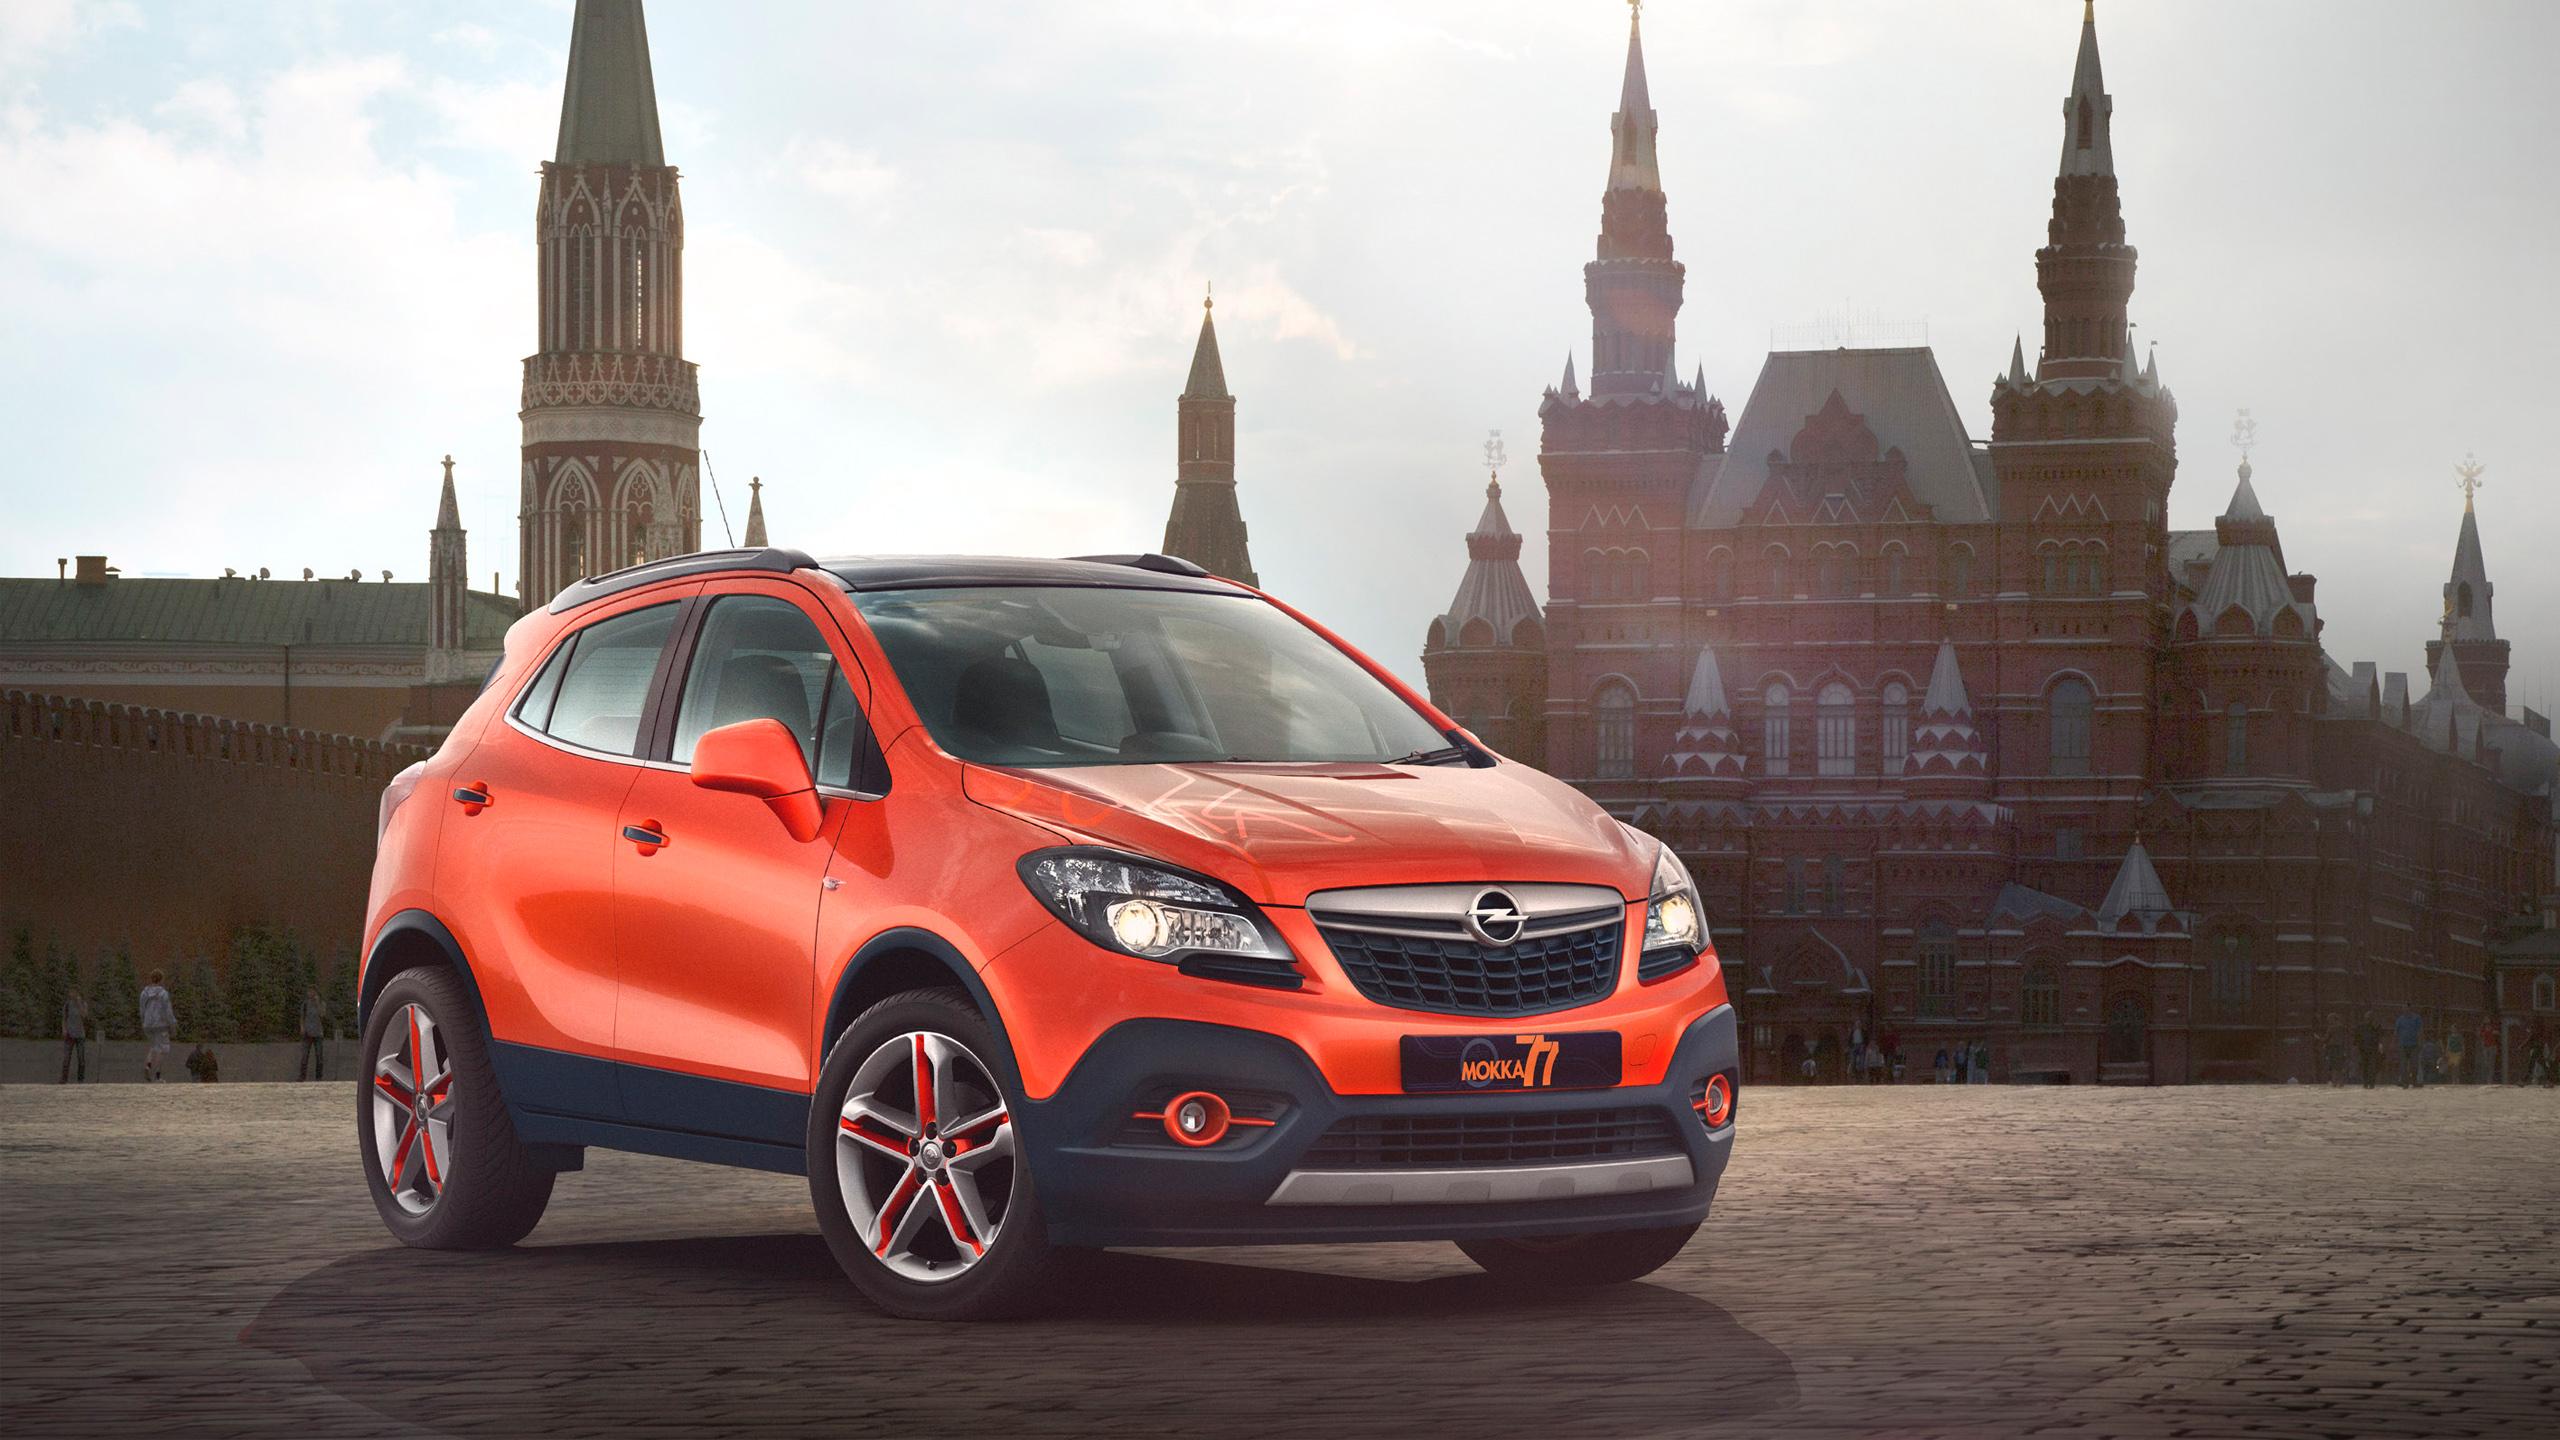 2015 Opel Mokka Moscow Edition Wallpaper Hd Car Wallpapers Id 4757